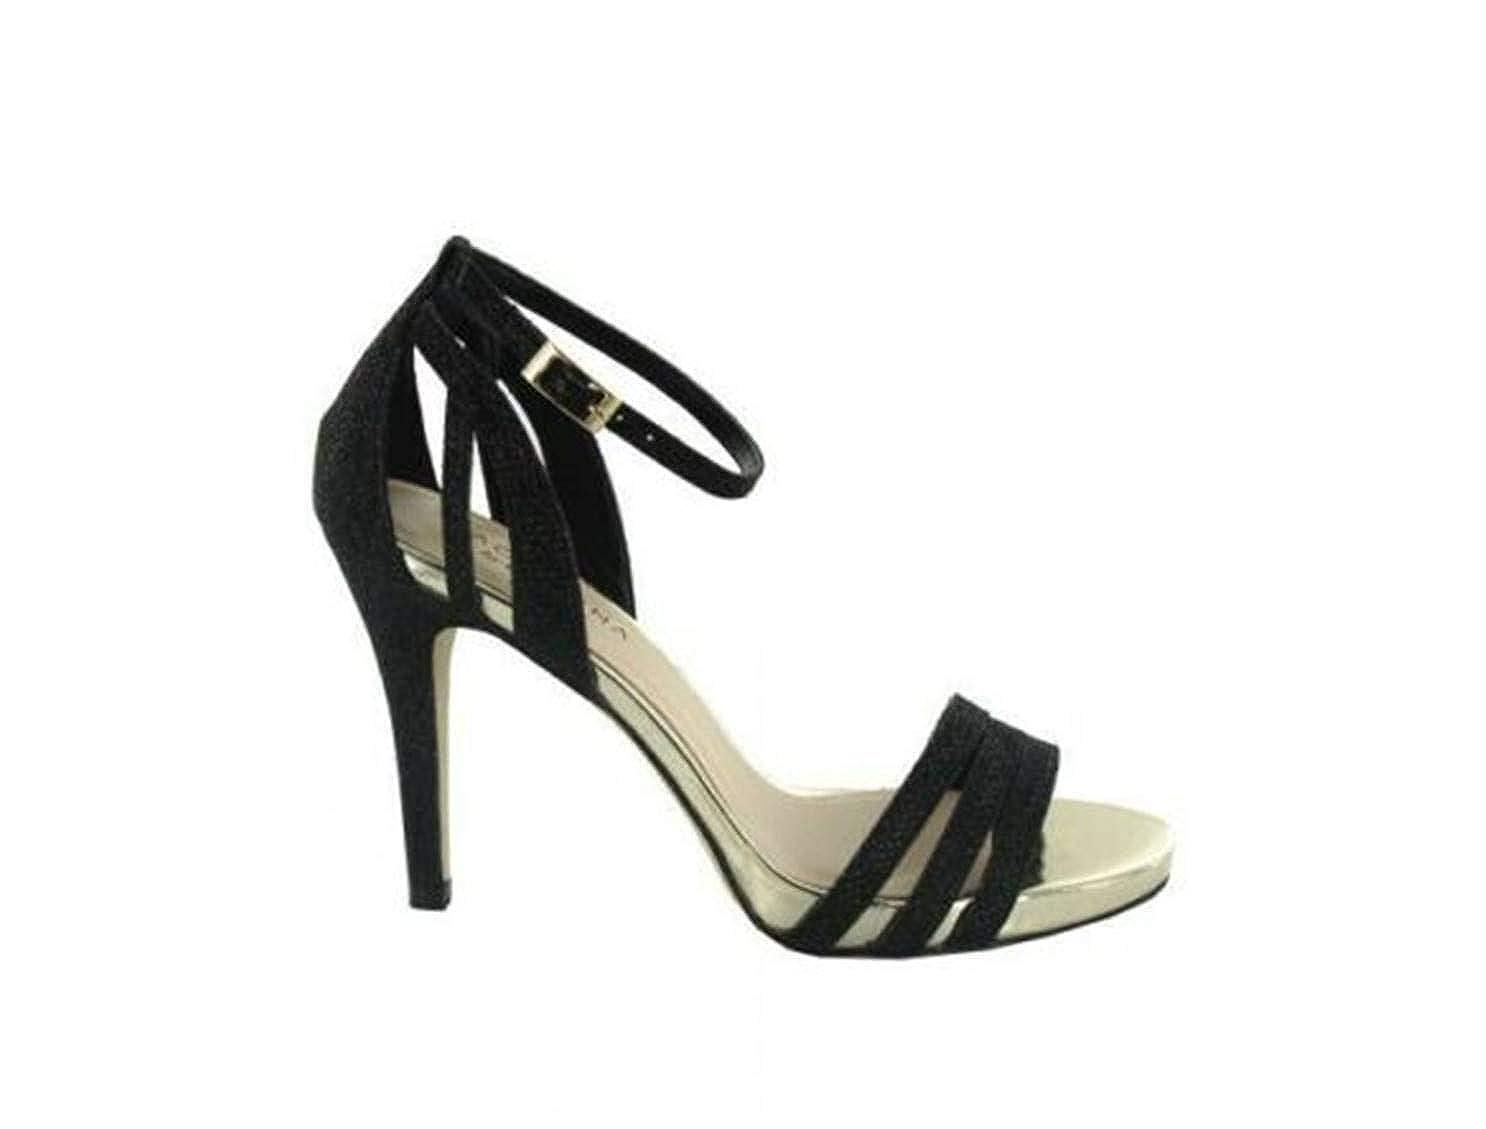 - Menbur Kigali 007540 Women's Sandals high Heel Black Stiletto